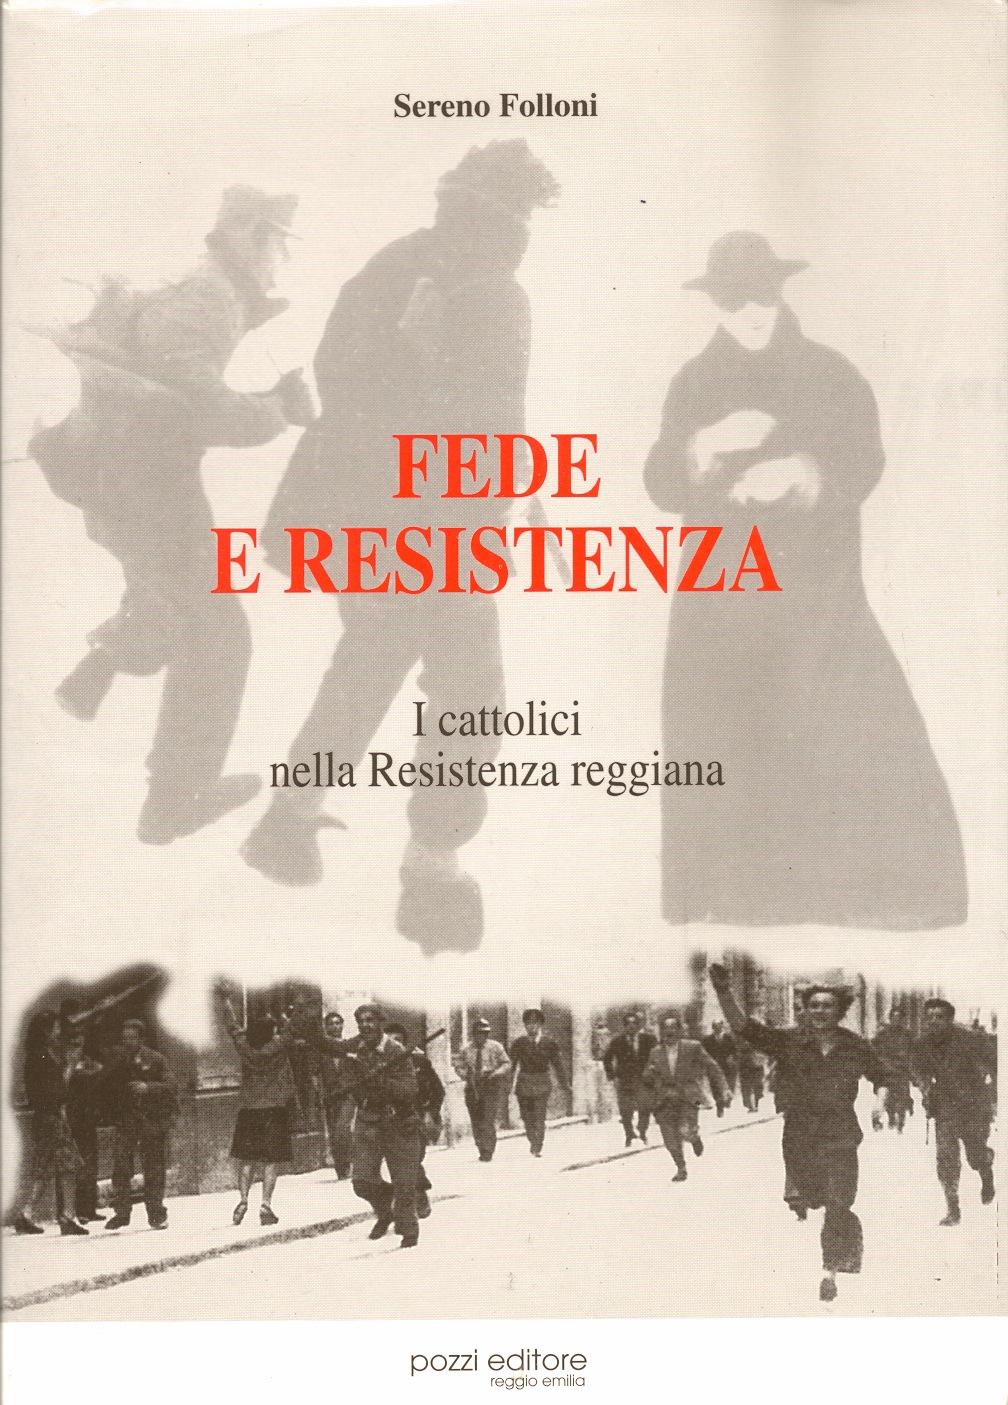 Fede e Resistenza